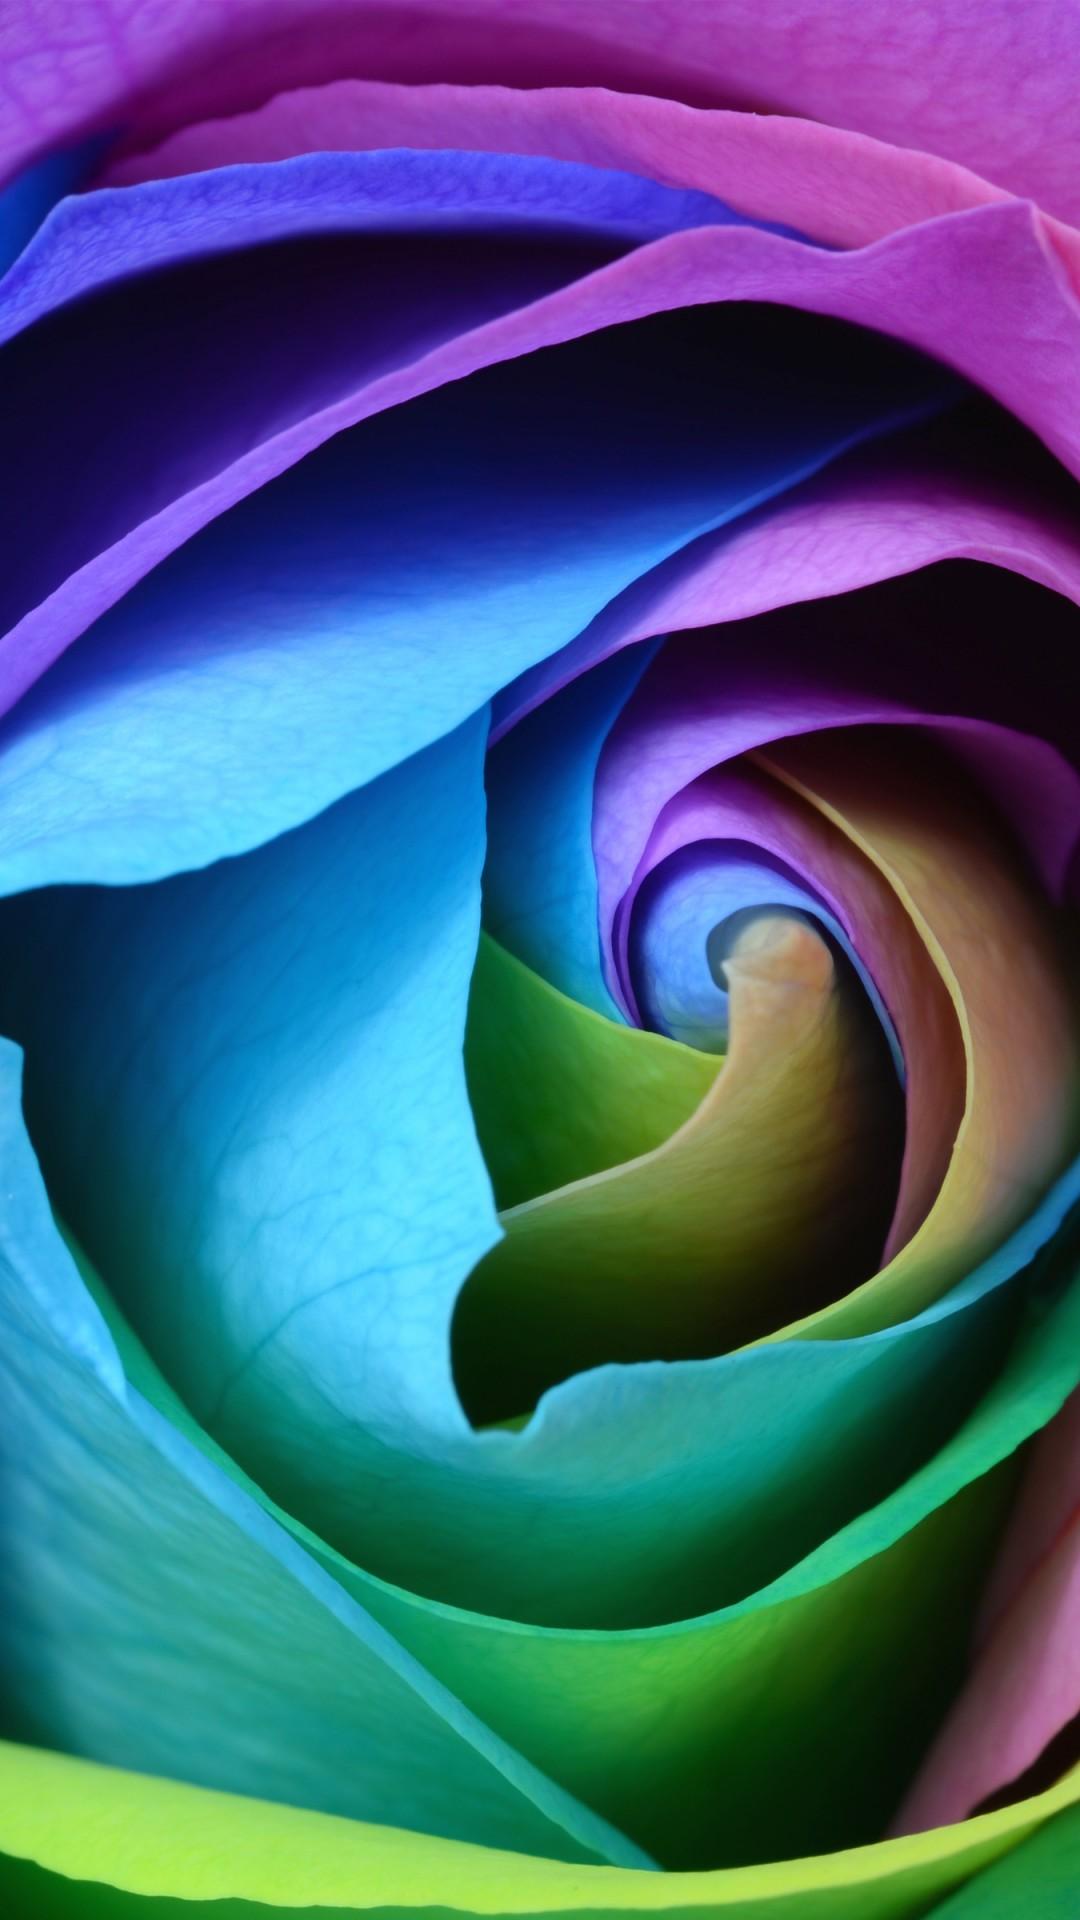 Download Free Hd Beautiful Rose Flower Wallpaper Iphone 6 6s Plus